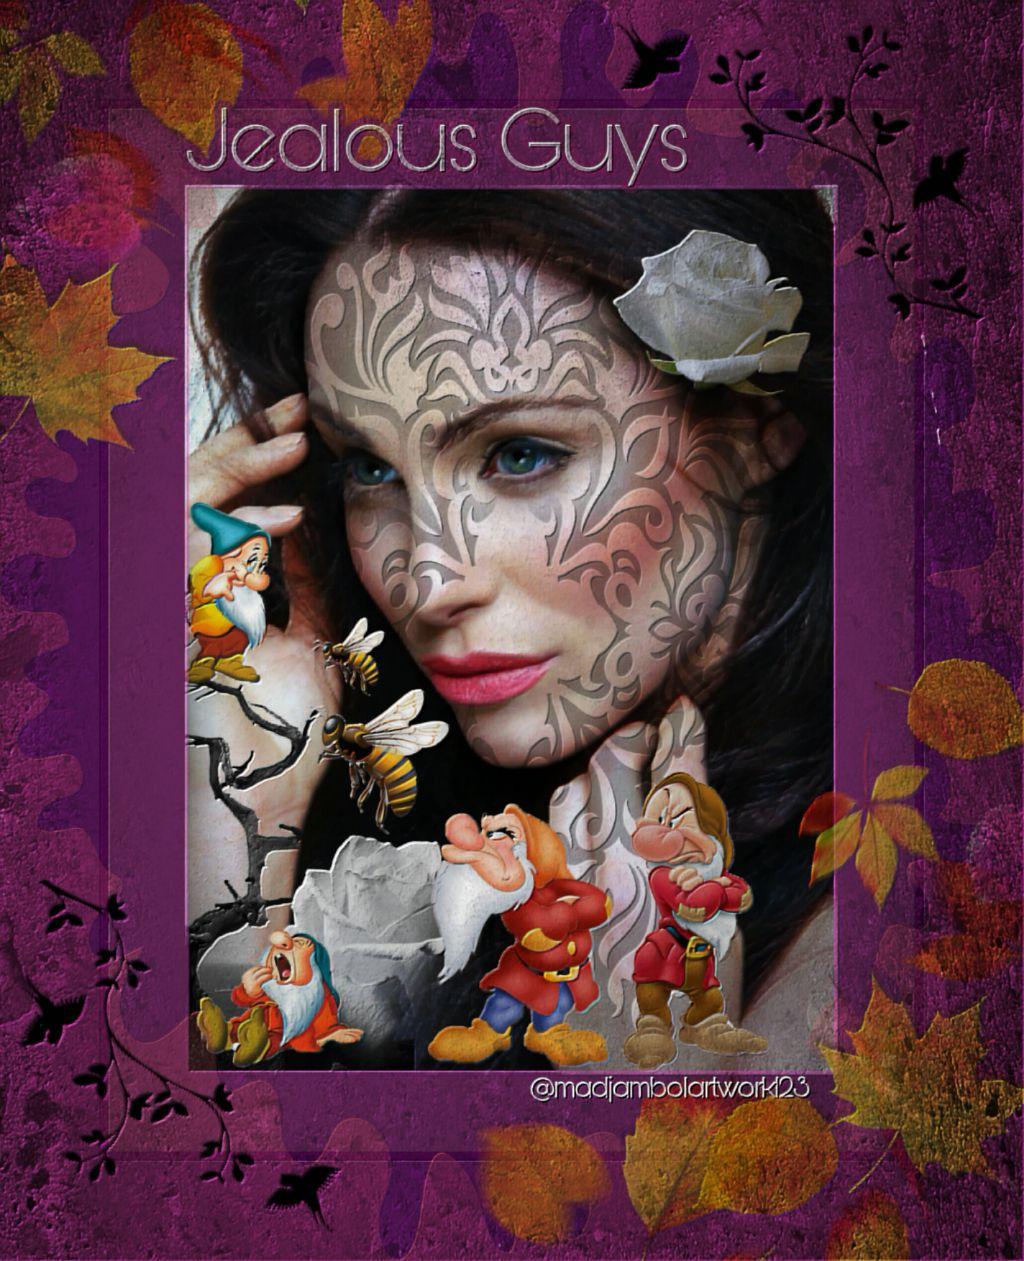 @madjambolartwork123 Mj.arts #dwarf #modelgirl #colorfulbackground #jealous Guys 💕💋💕